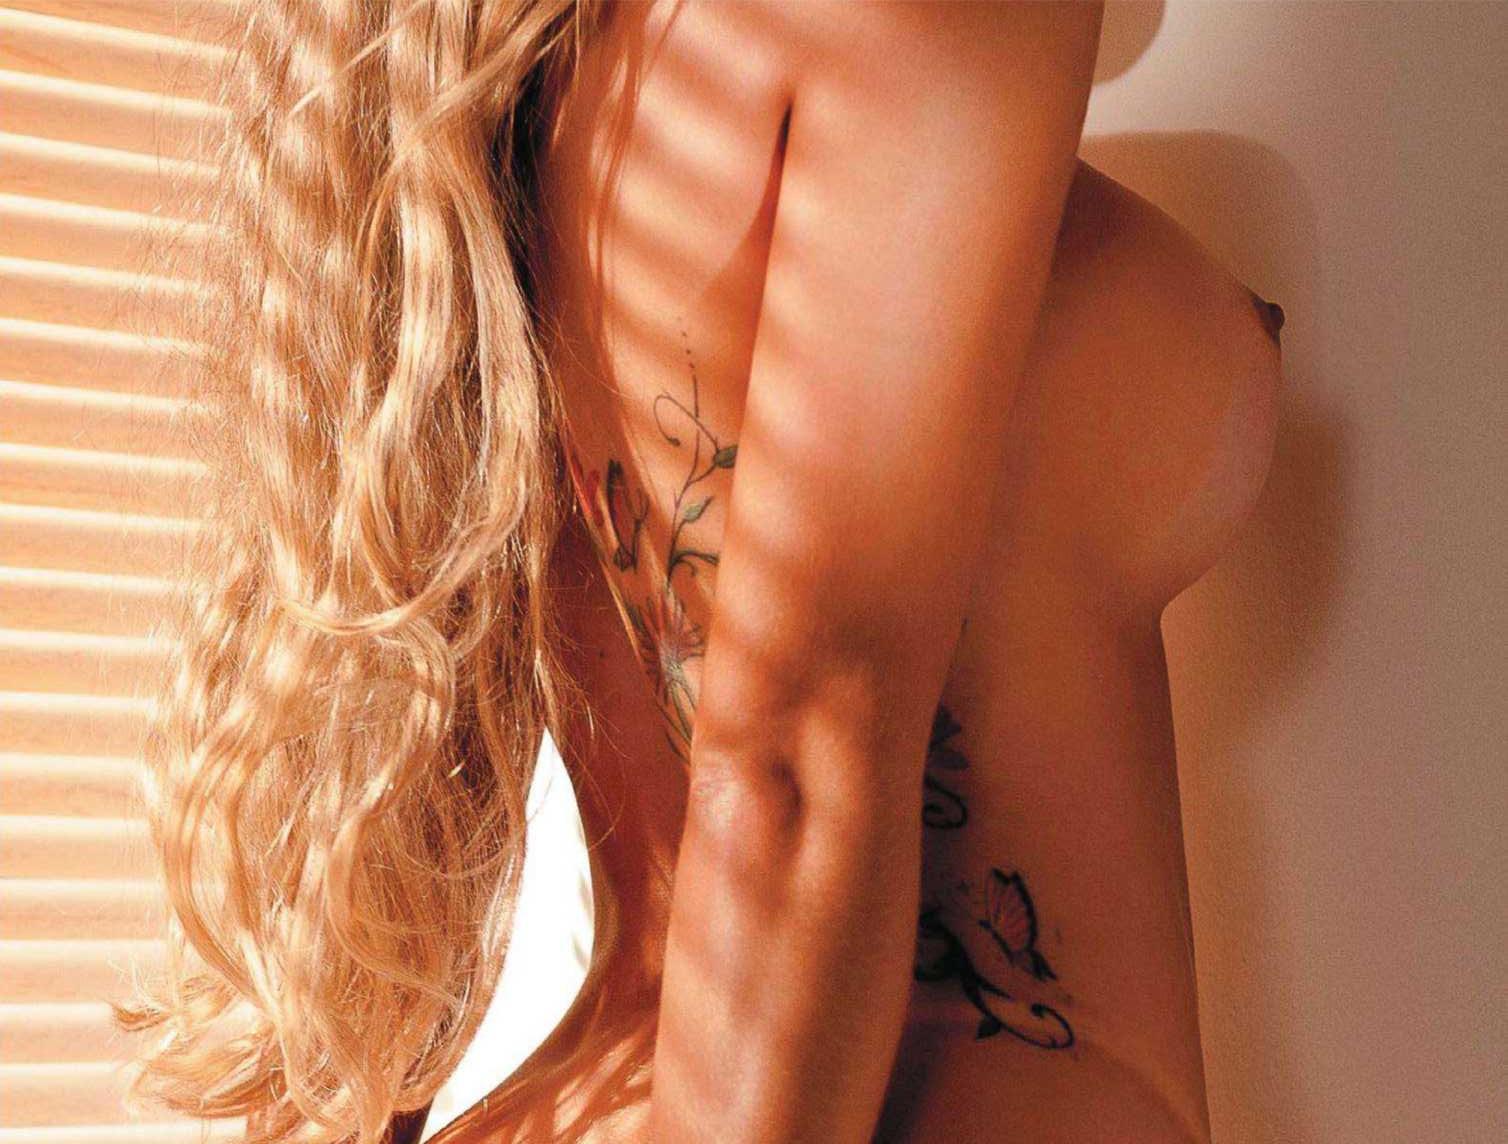 Revista Playboy Capa Aryane Steinkopf A Delicia Que O P Nico